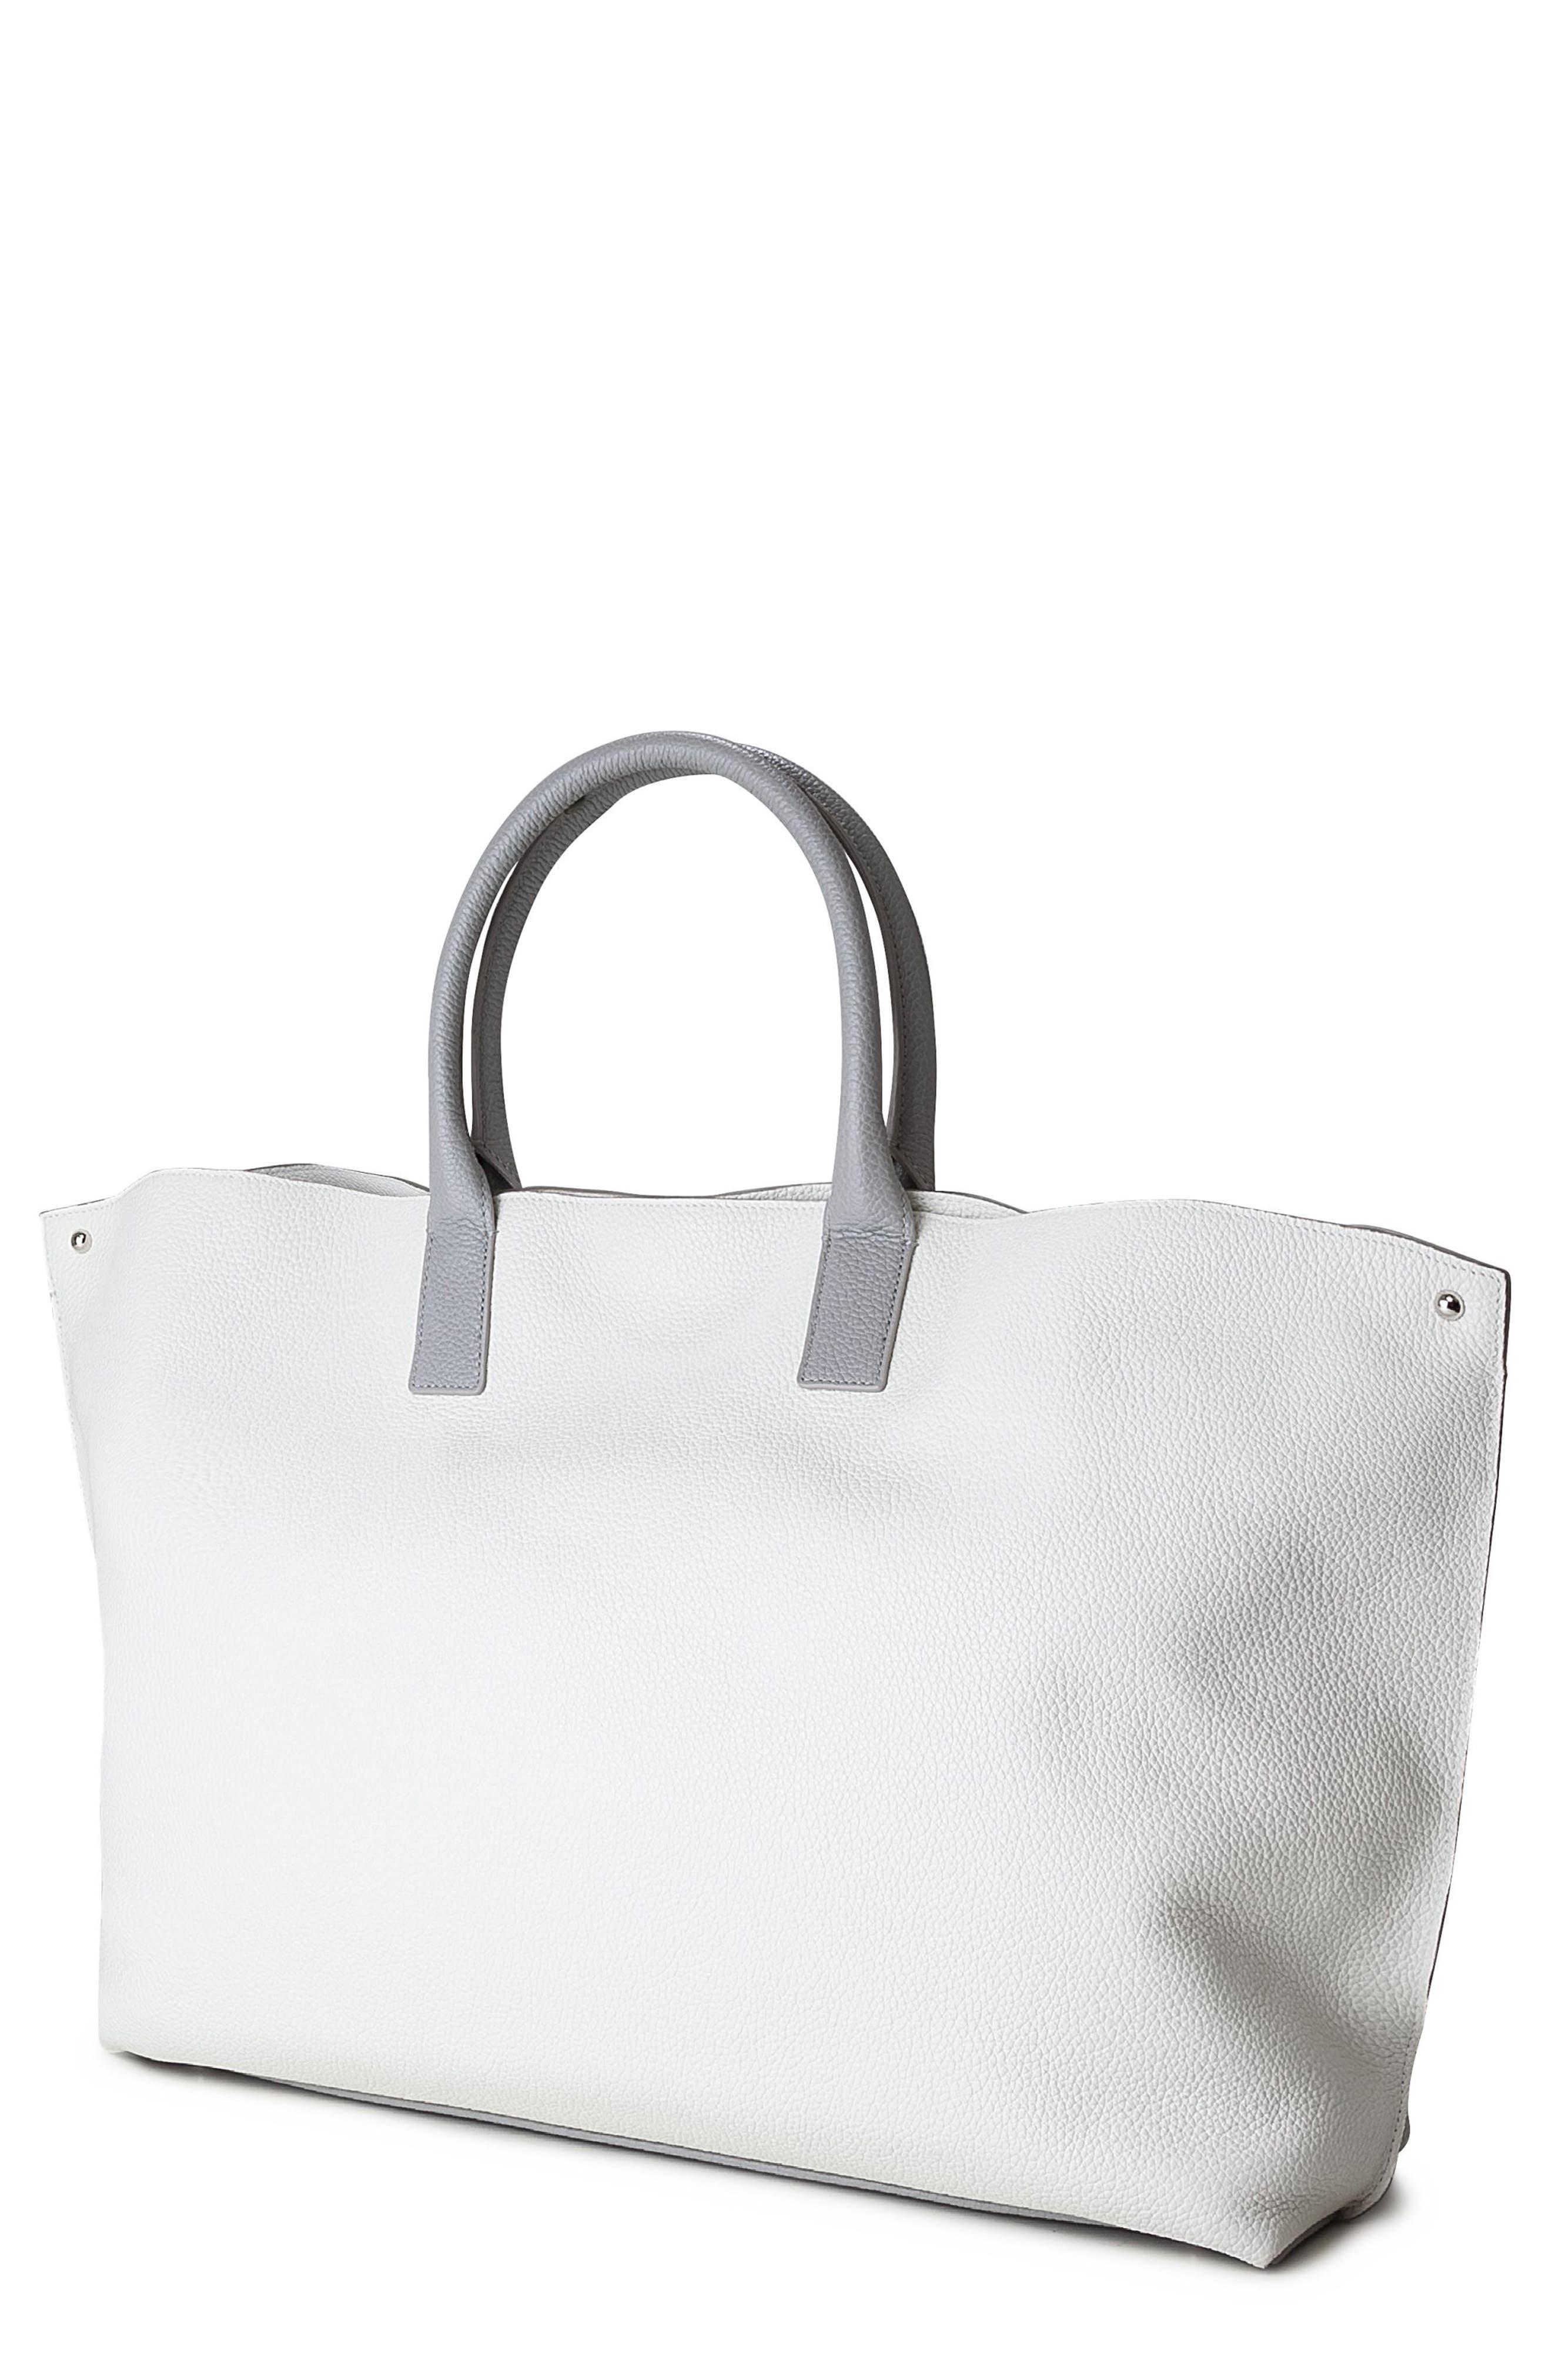 'AI Medium Messenger' Tricolor Leather Tote,                         Main,                         color, Marmo/ White/ Light Silver